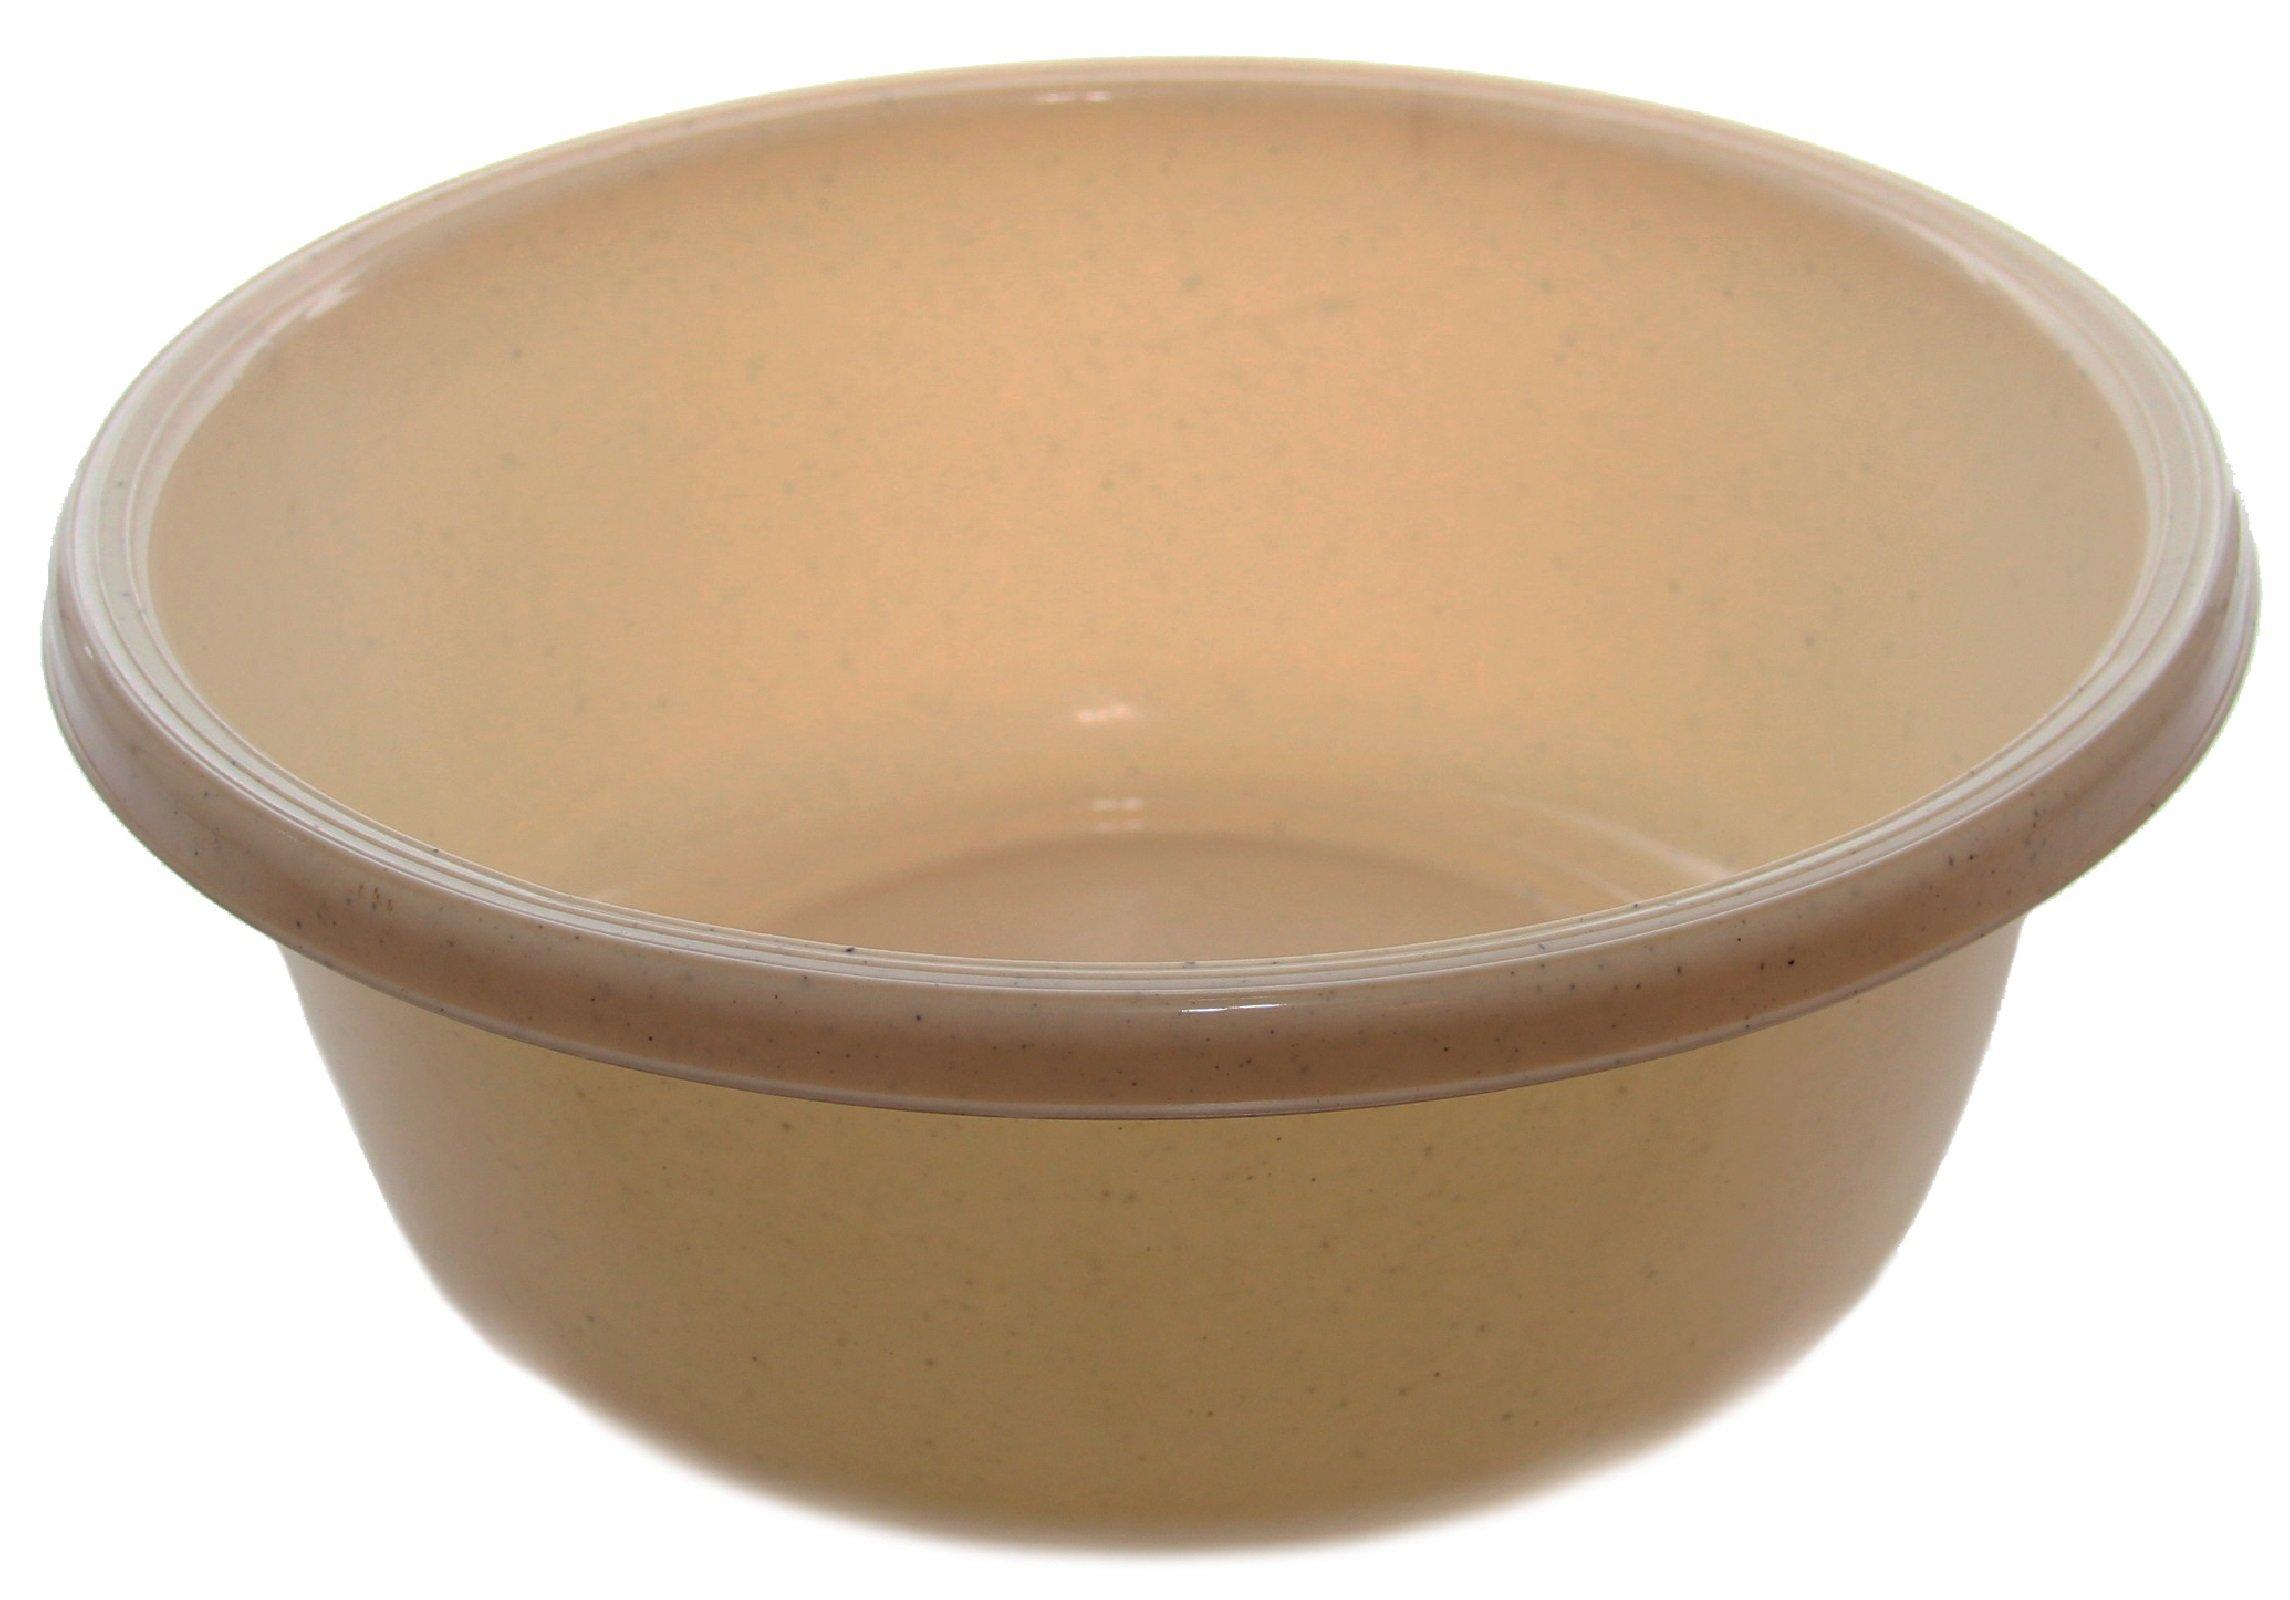 Ybm Home Round Plastic Wash Basin 1148 (2, Beige with Dots)